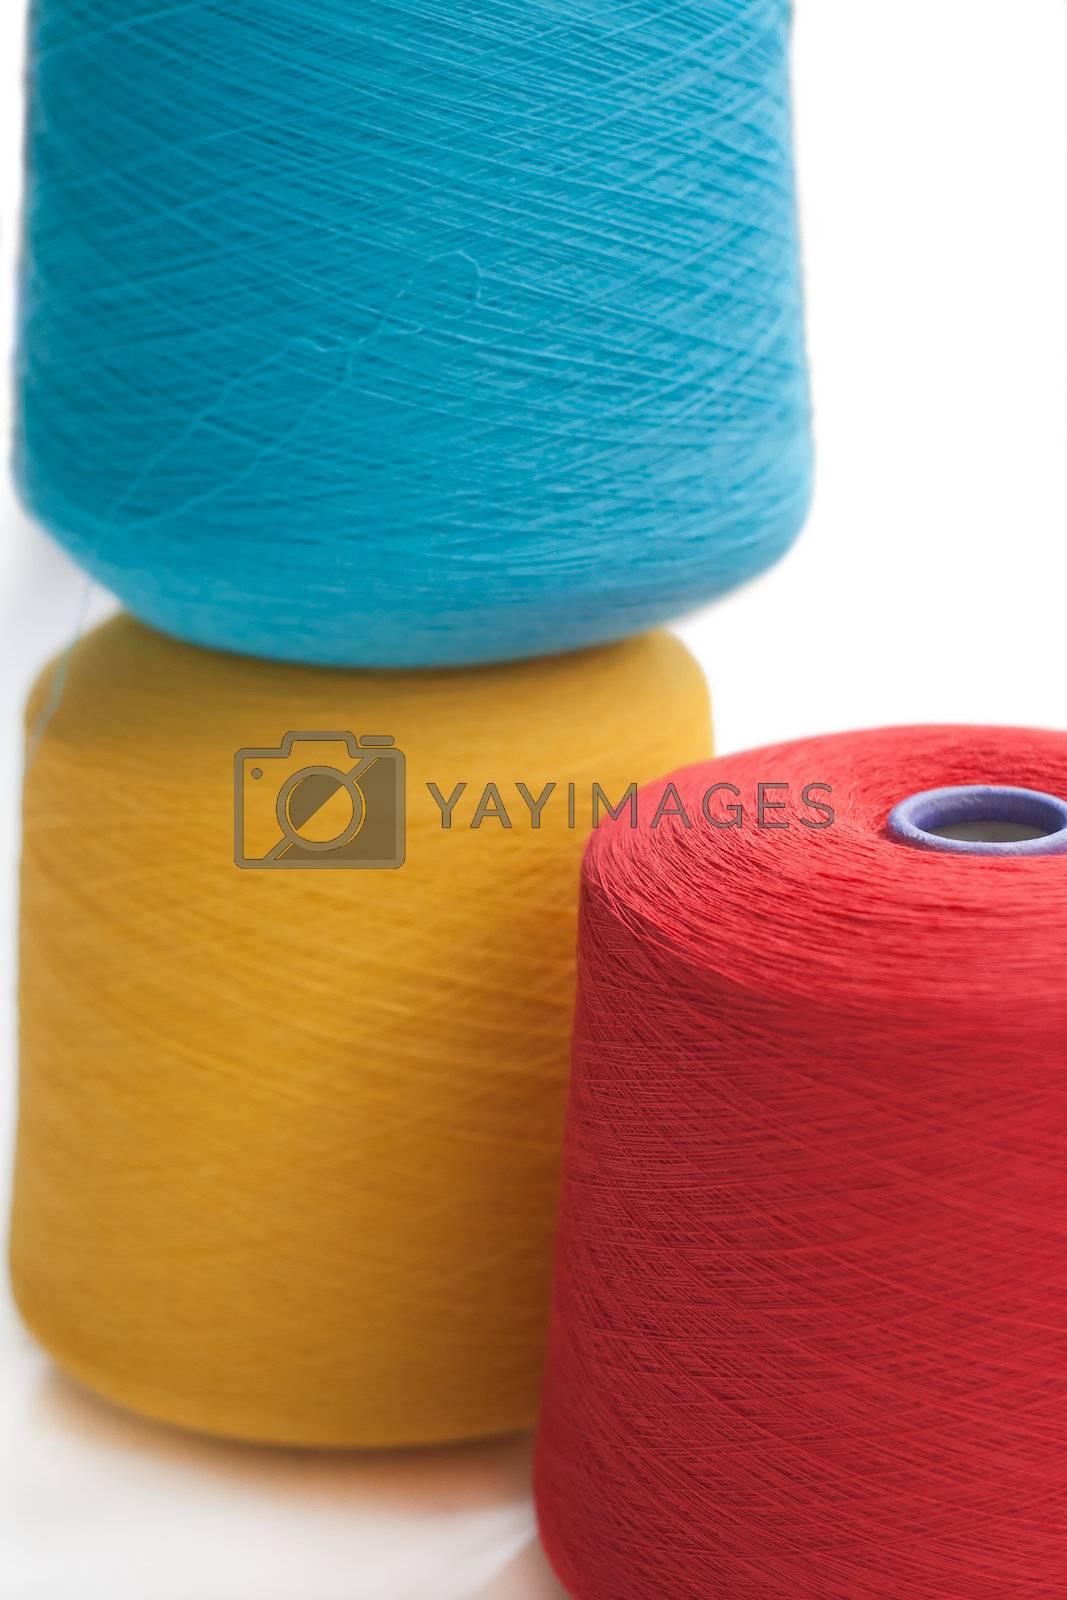 Cone fiber with several colors